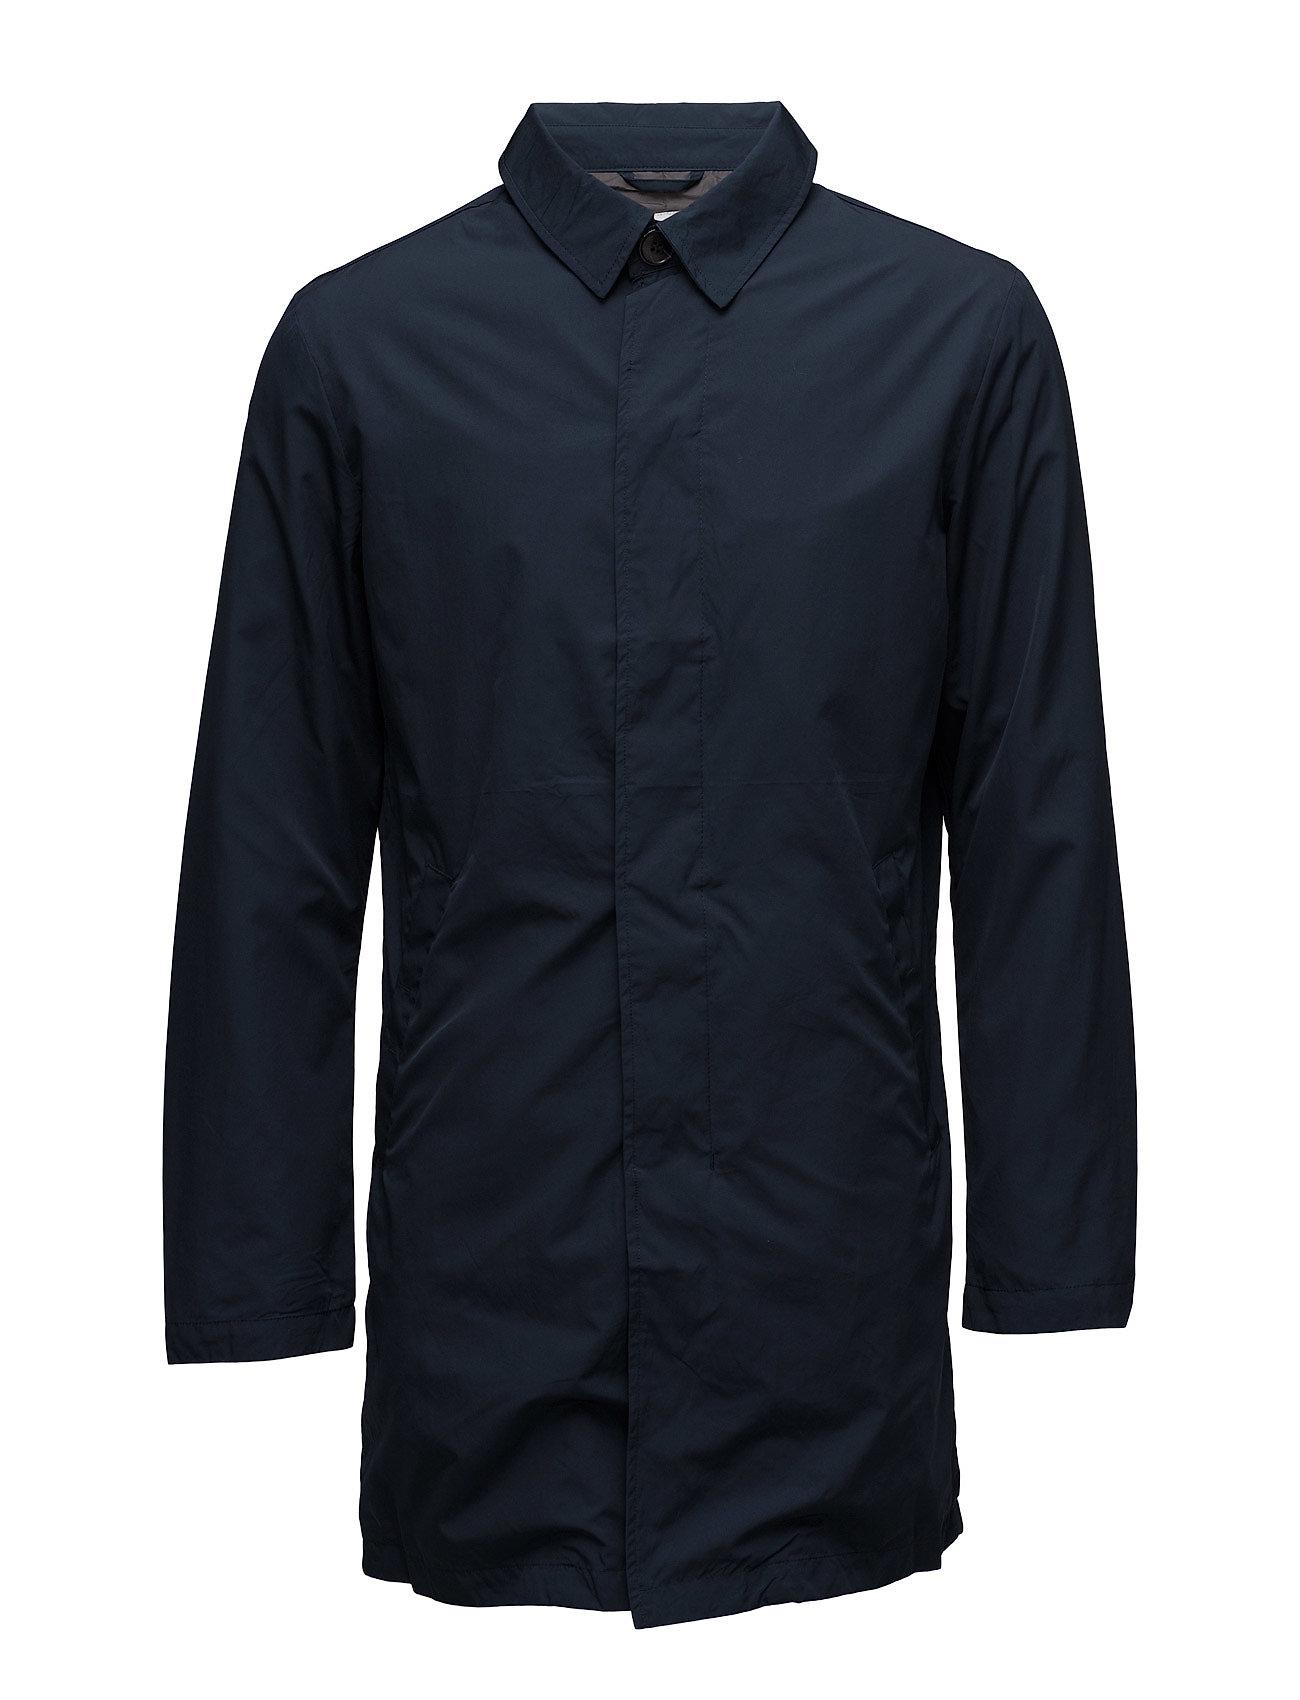 Shdnewfelix Nylon Coat Selected Homme Frakker til Mænd i Sort